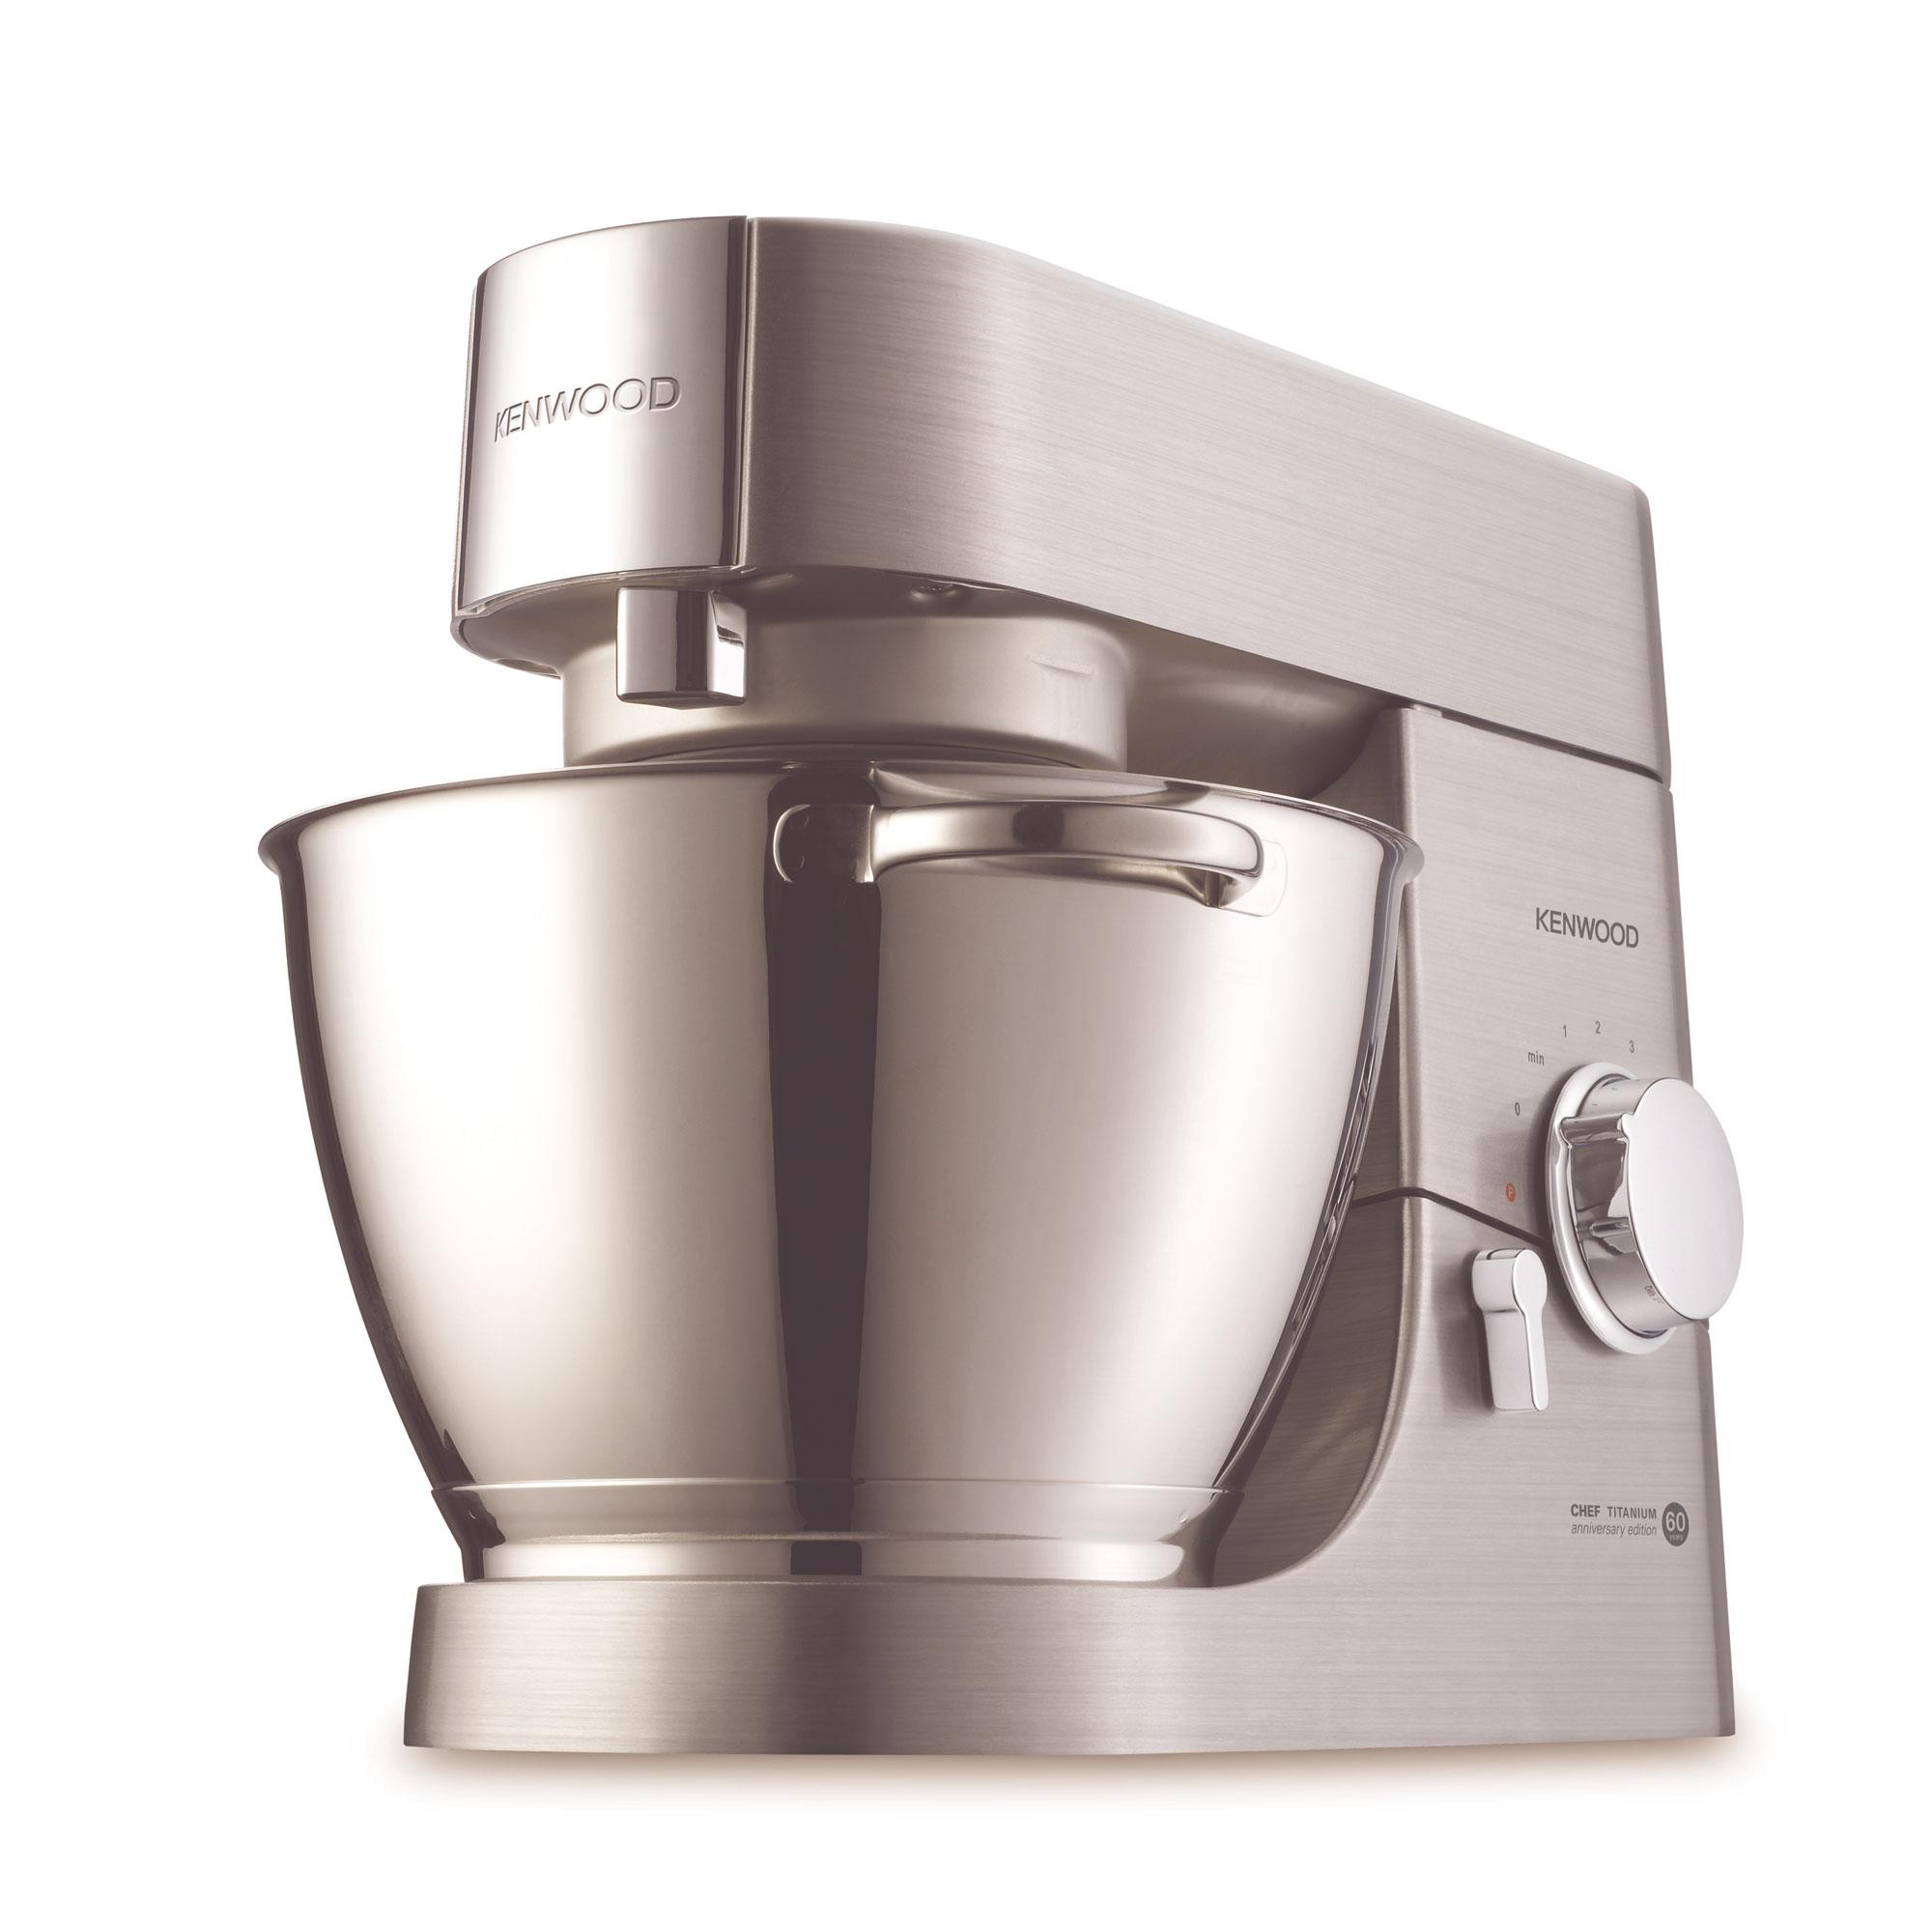 kenwood kmy60 robot chef titanium finition inox bross. Black Bedroom Furniture Sets. Home Design Ideas